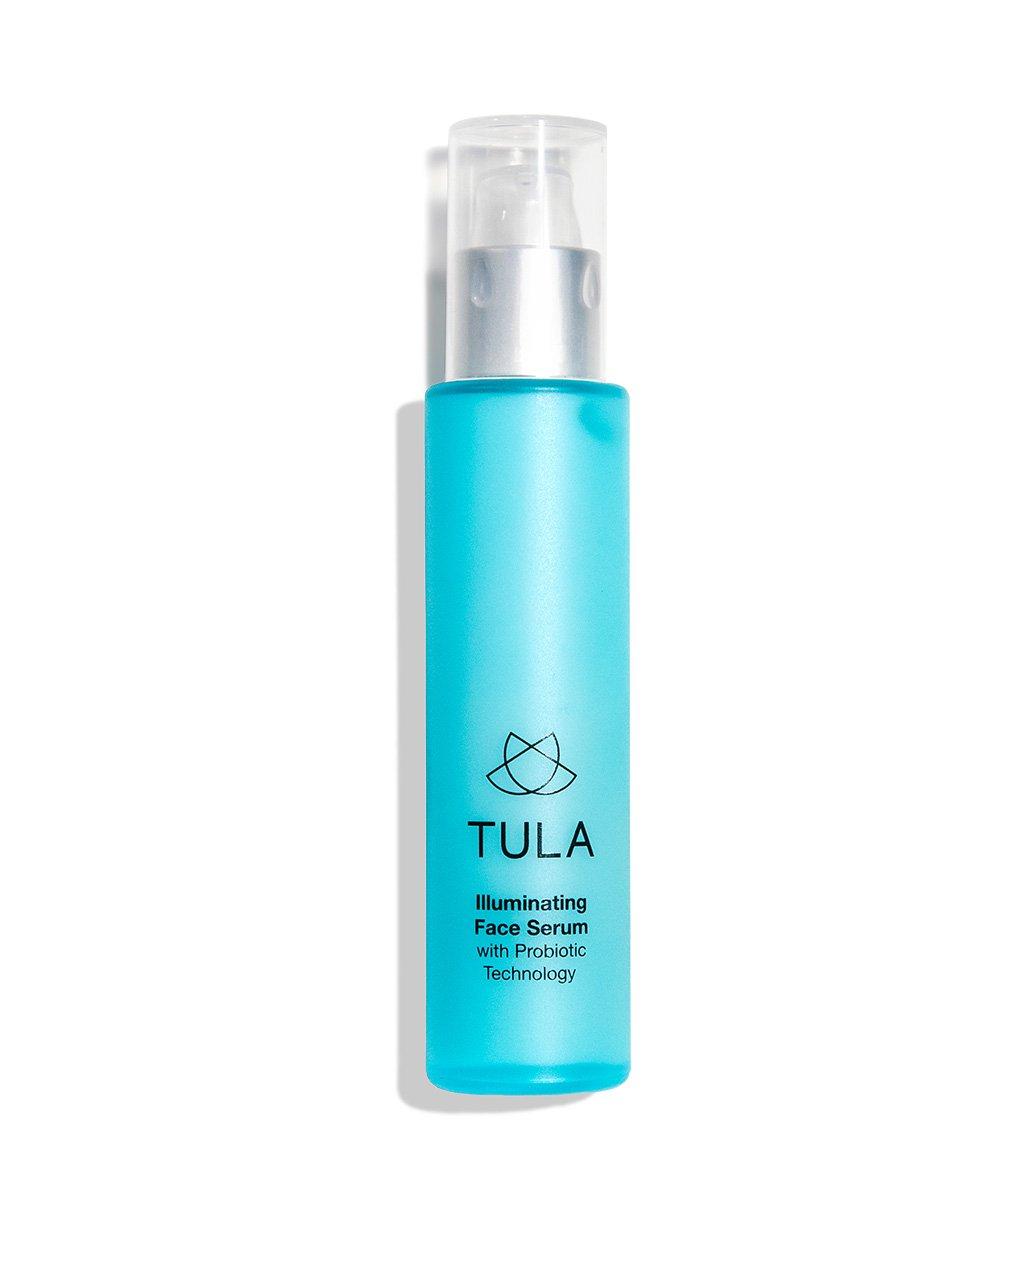 TULA Probiotic Skin Care Illuminating Face Serum, 1.6 oz. – Anti-Aging & Tone Correcting Facial Serum for Smooth & Even Complexion